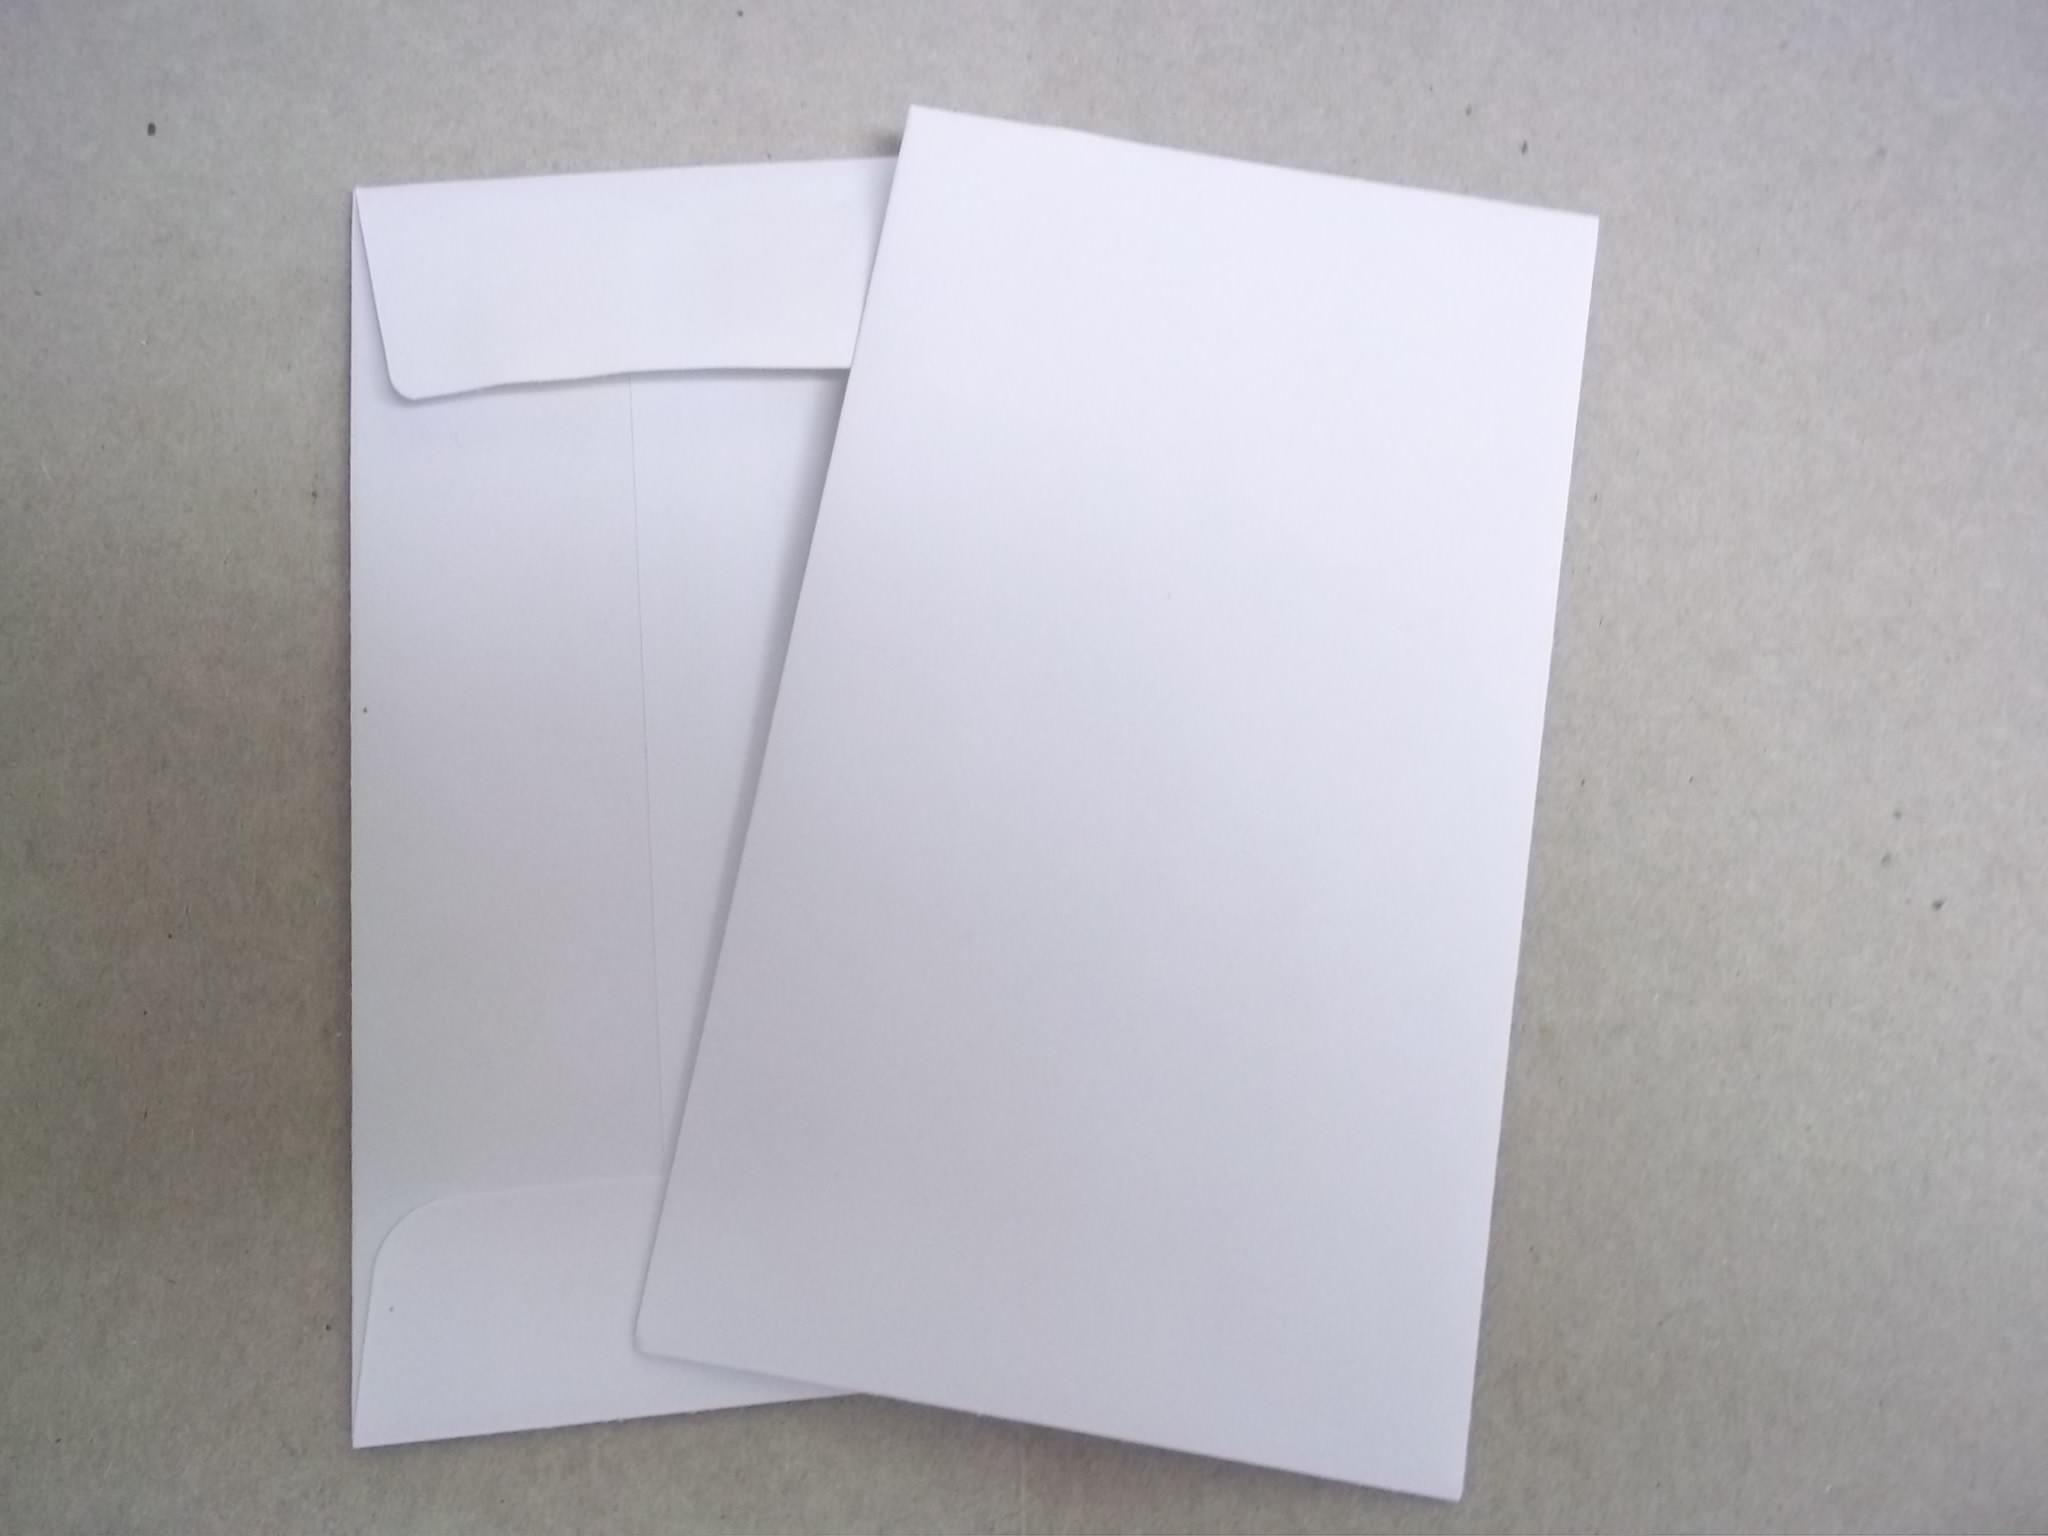 EV208 Blank Job Envelopes- box of 500-White